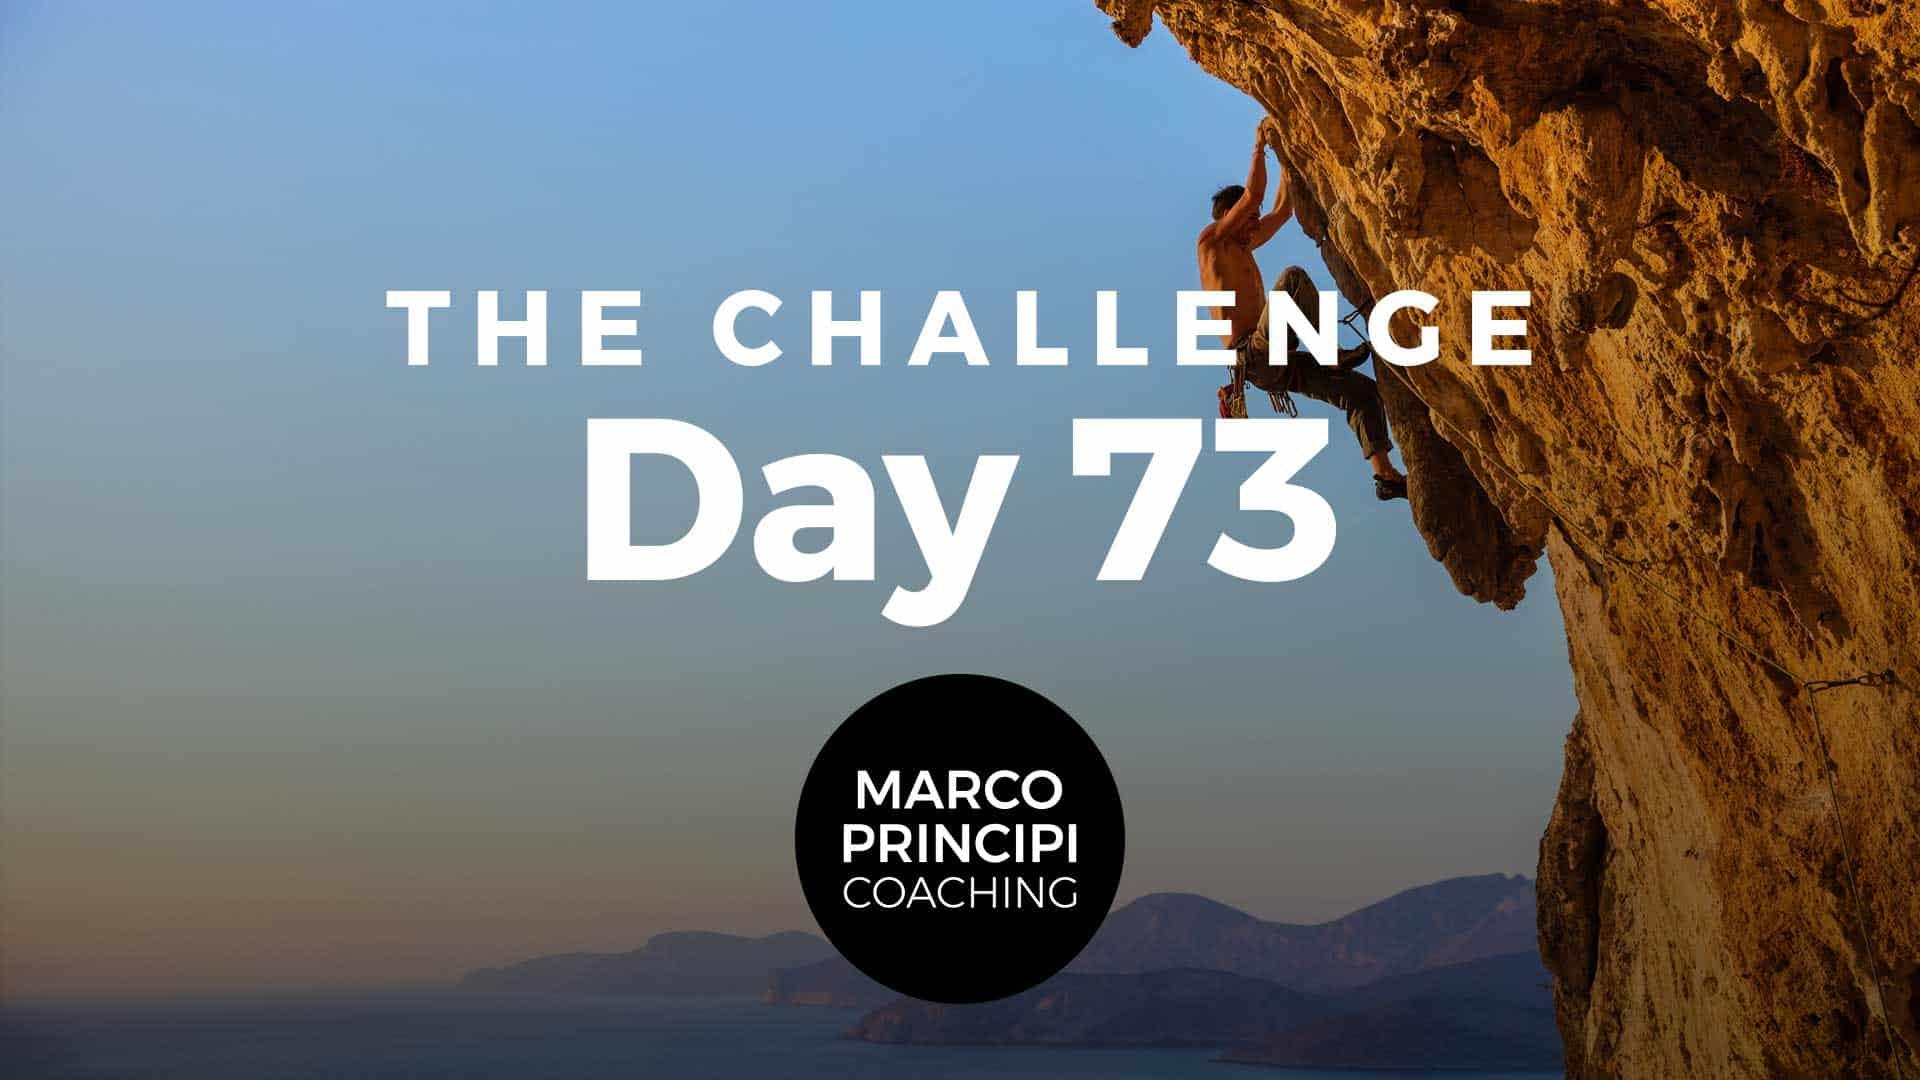 Marco Principi Coaching Challenge Day 73